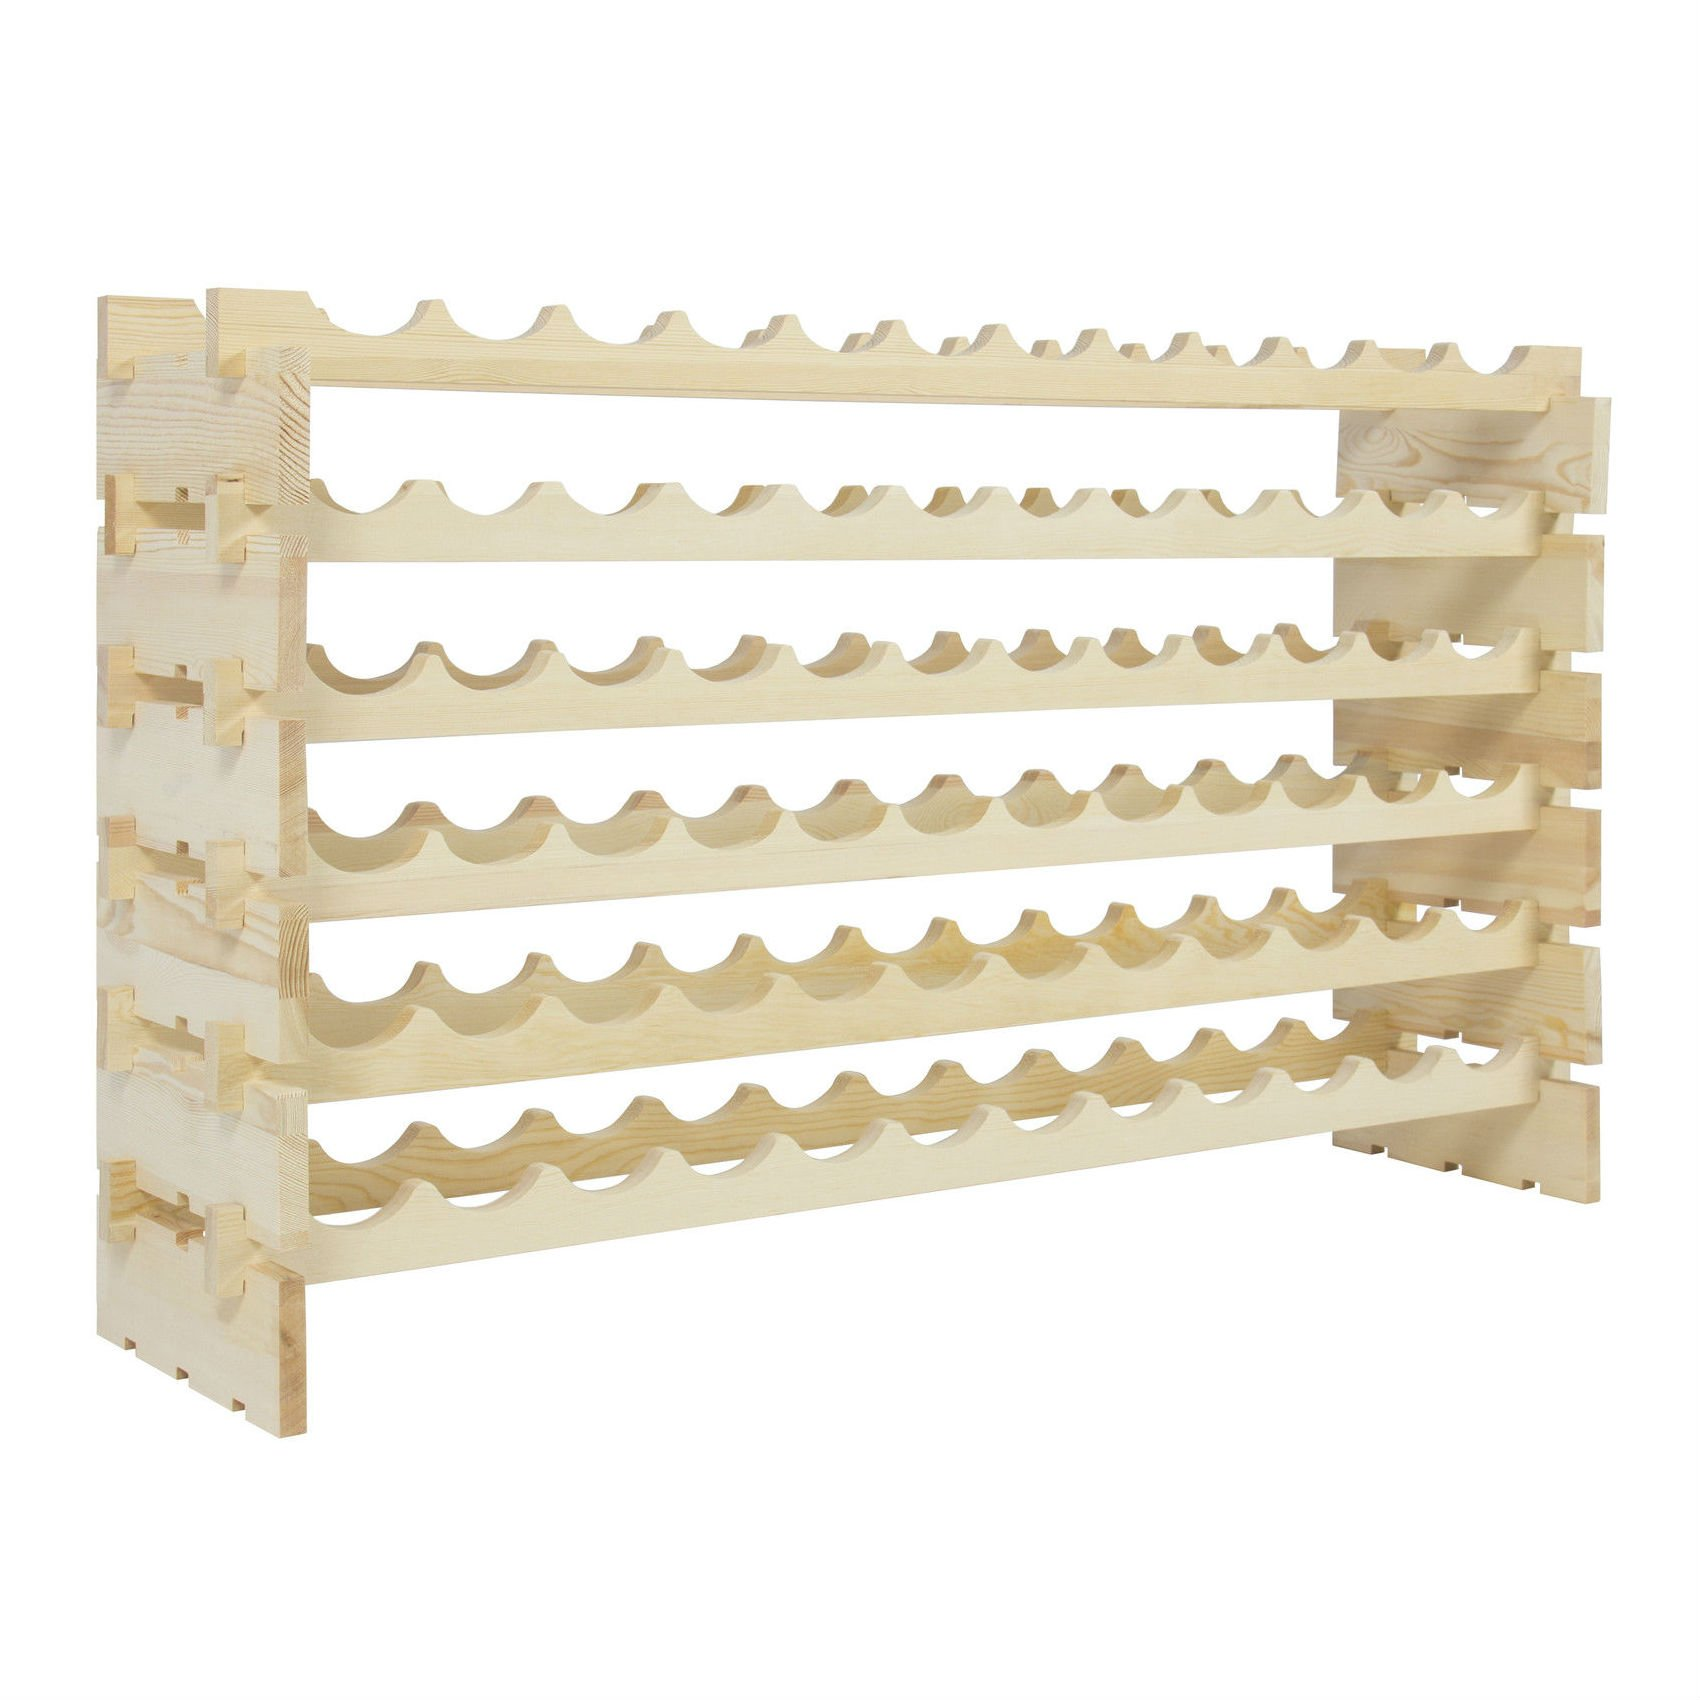 Wine Rack 72 Bottles Stackable Storage 6 Tier Solid Wood Display Shelves Most Viewed